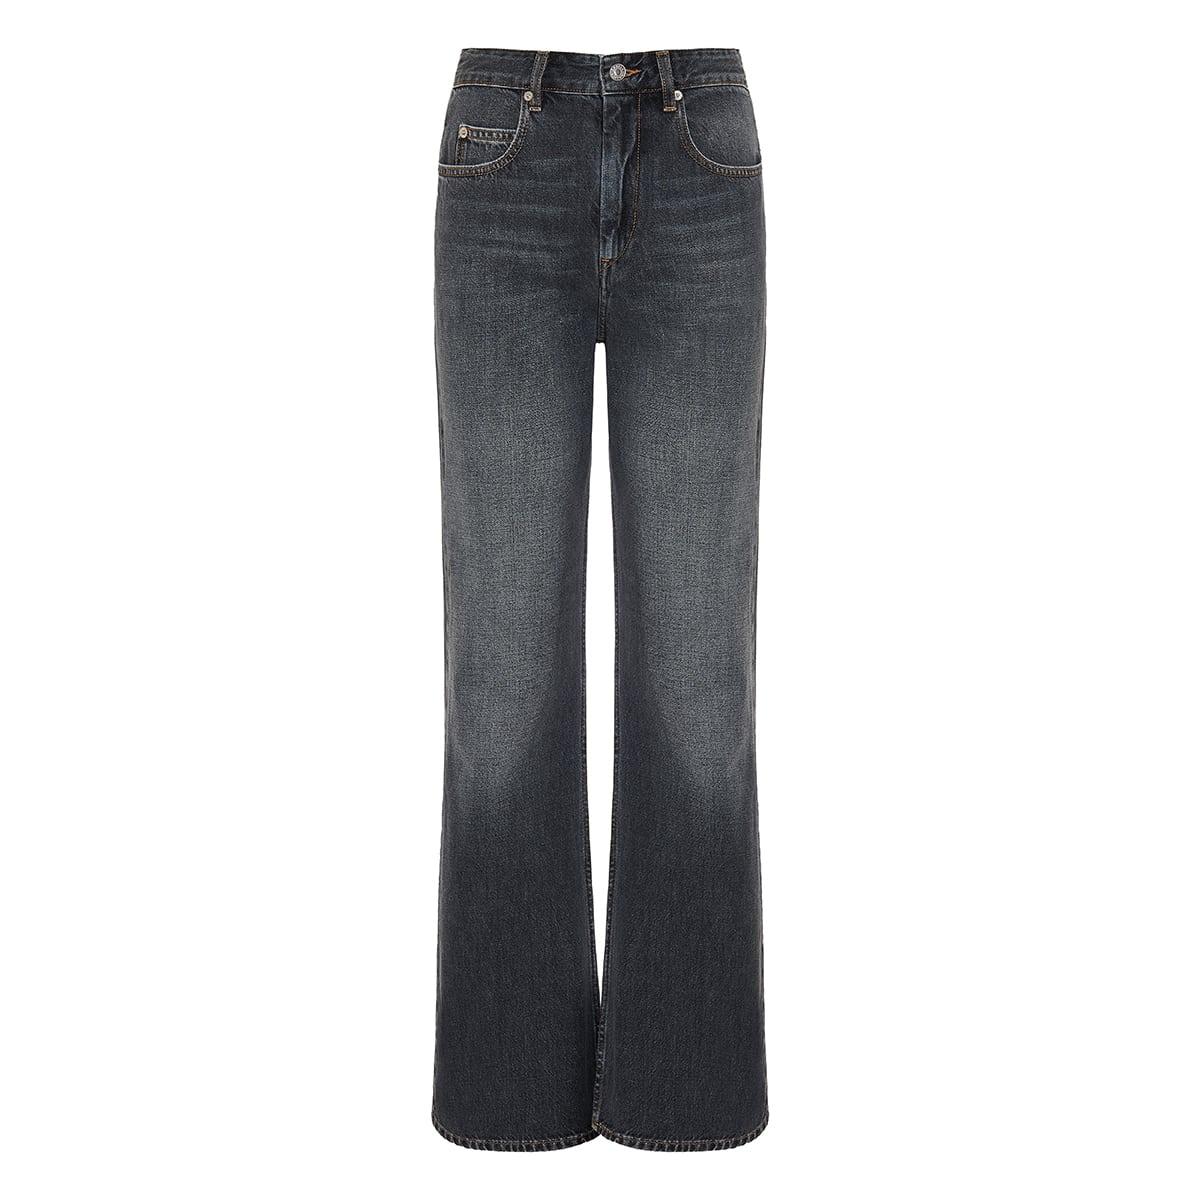 Corsy wide-leg jeans